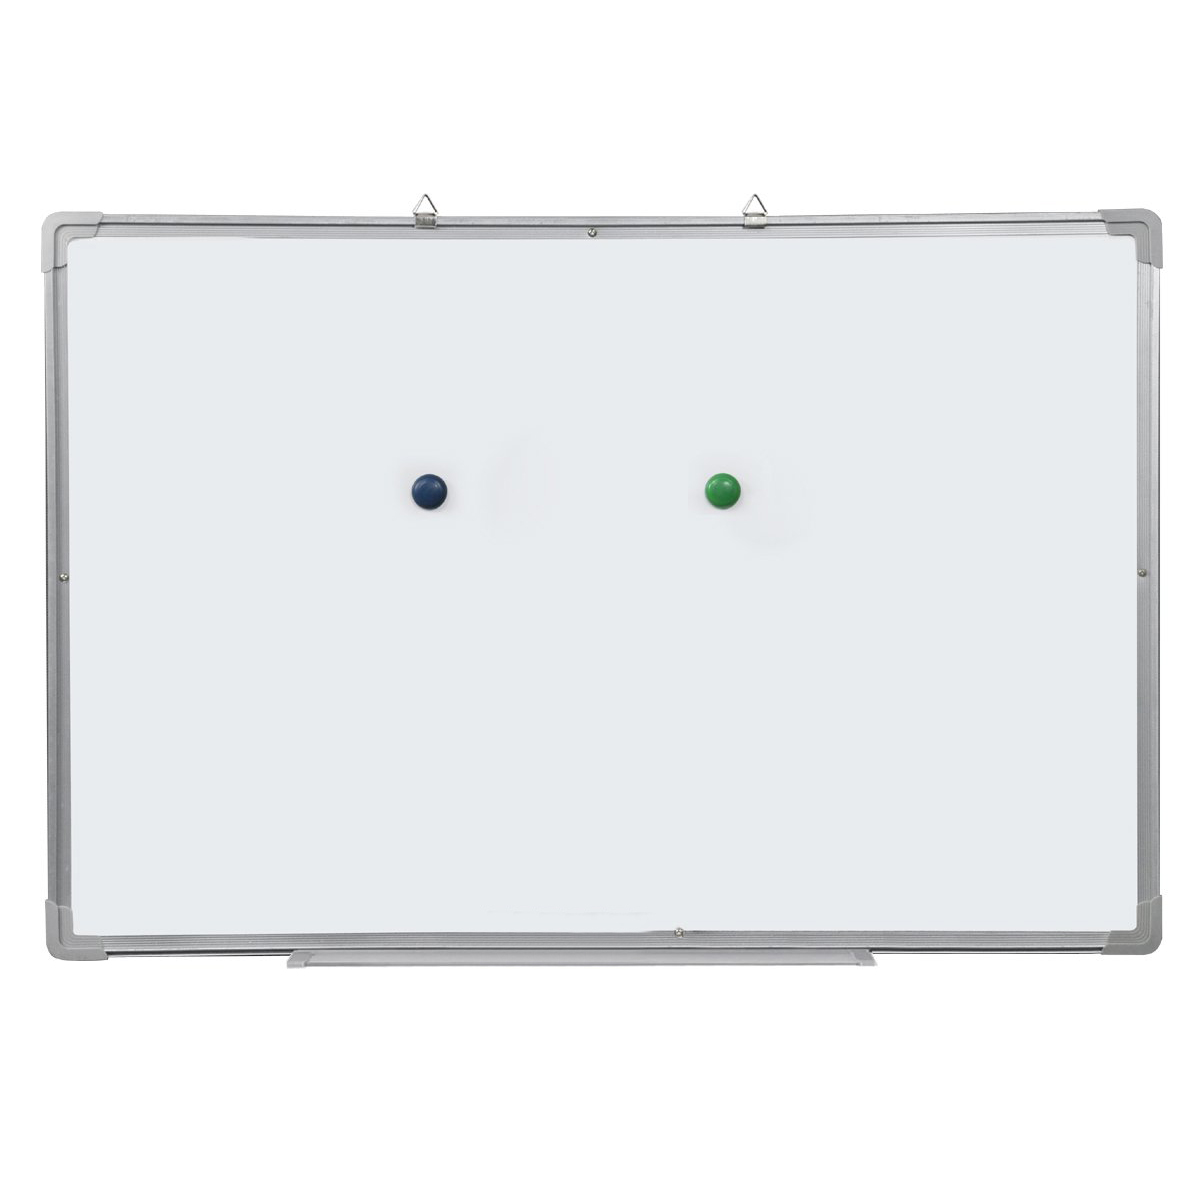 70x50cm Dry Erase Magnetic White Board Classroom Teaching Board<br><br>Aliexpress